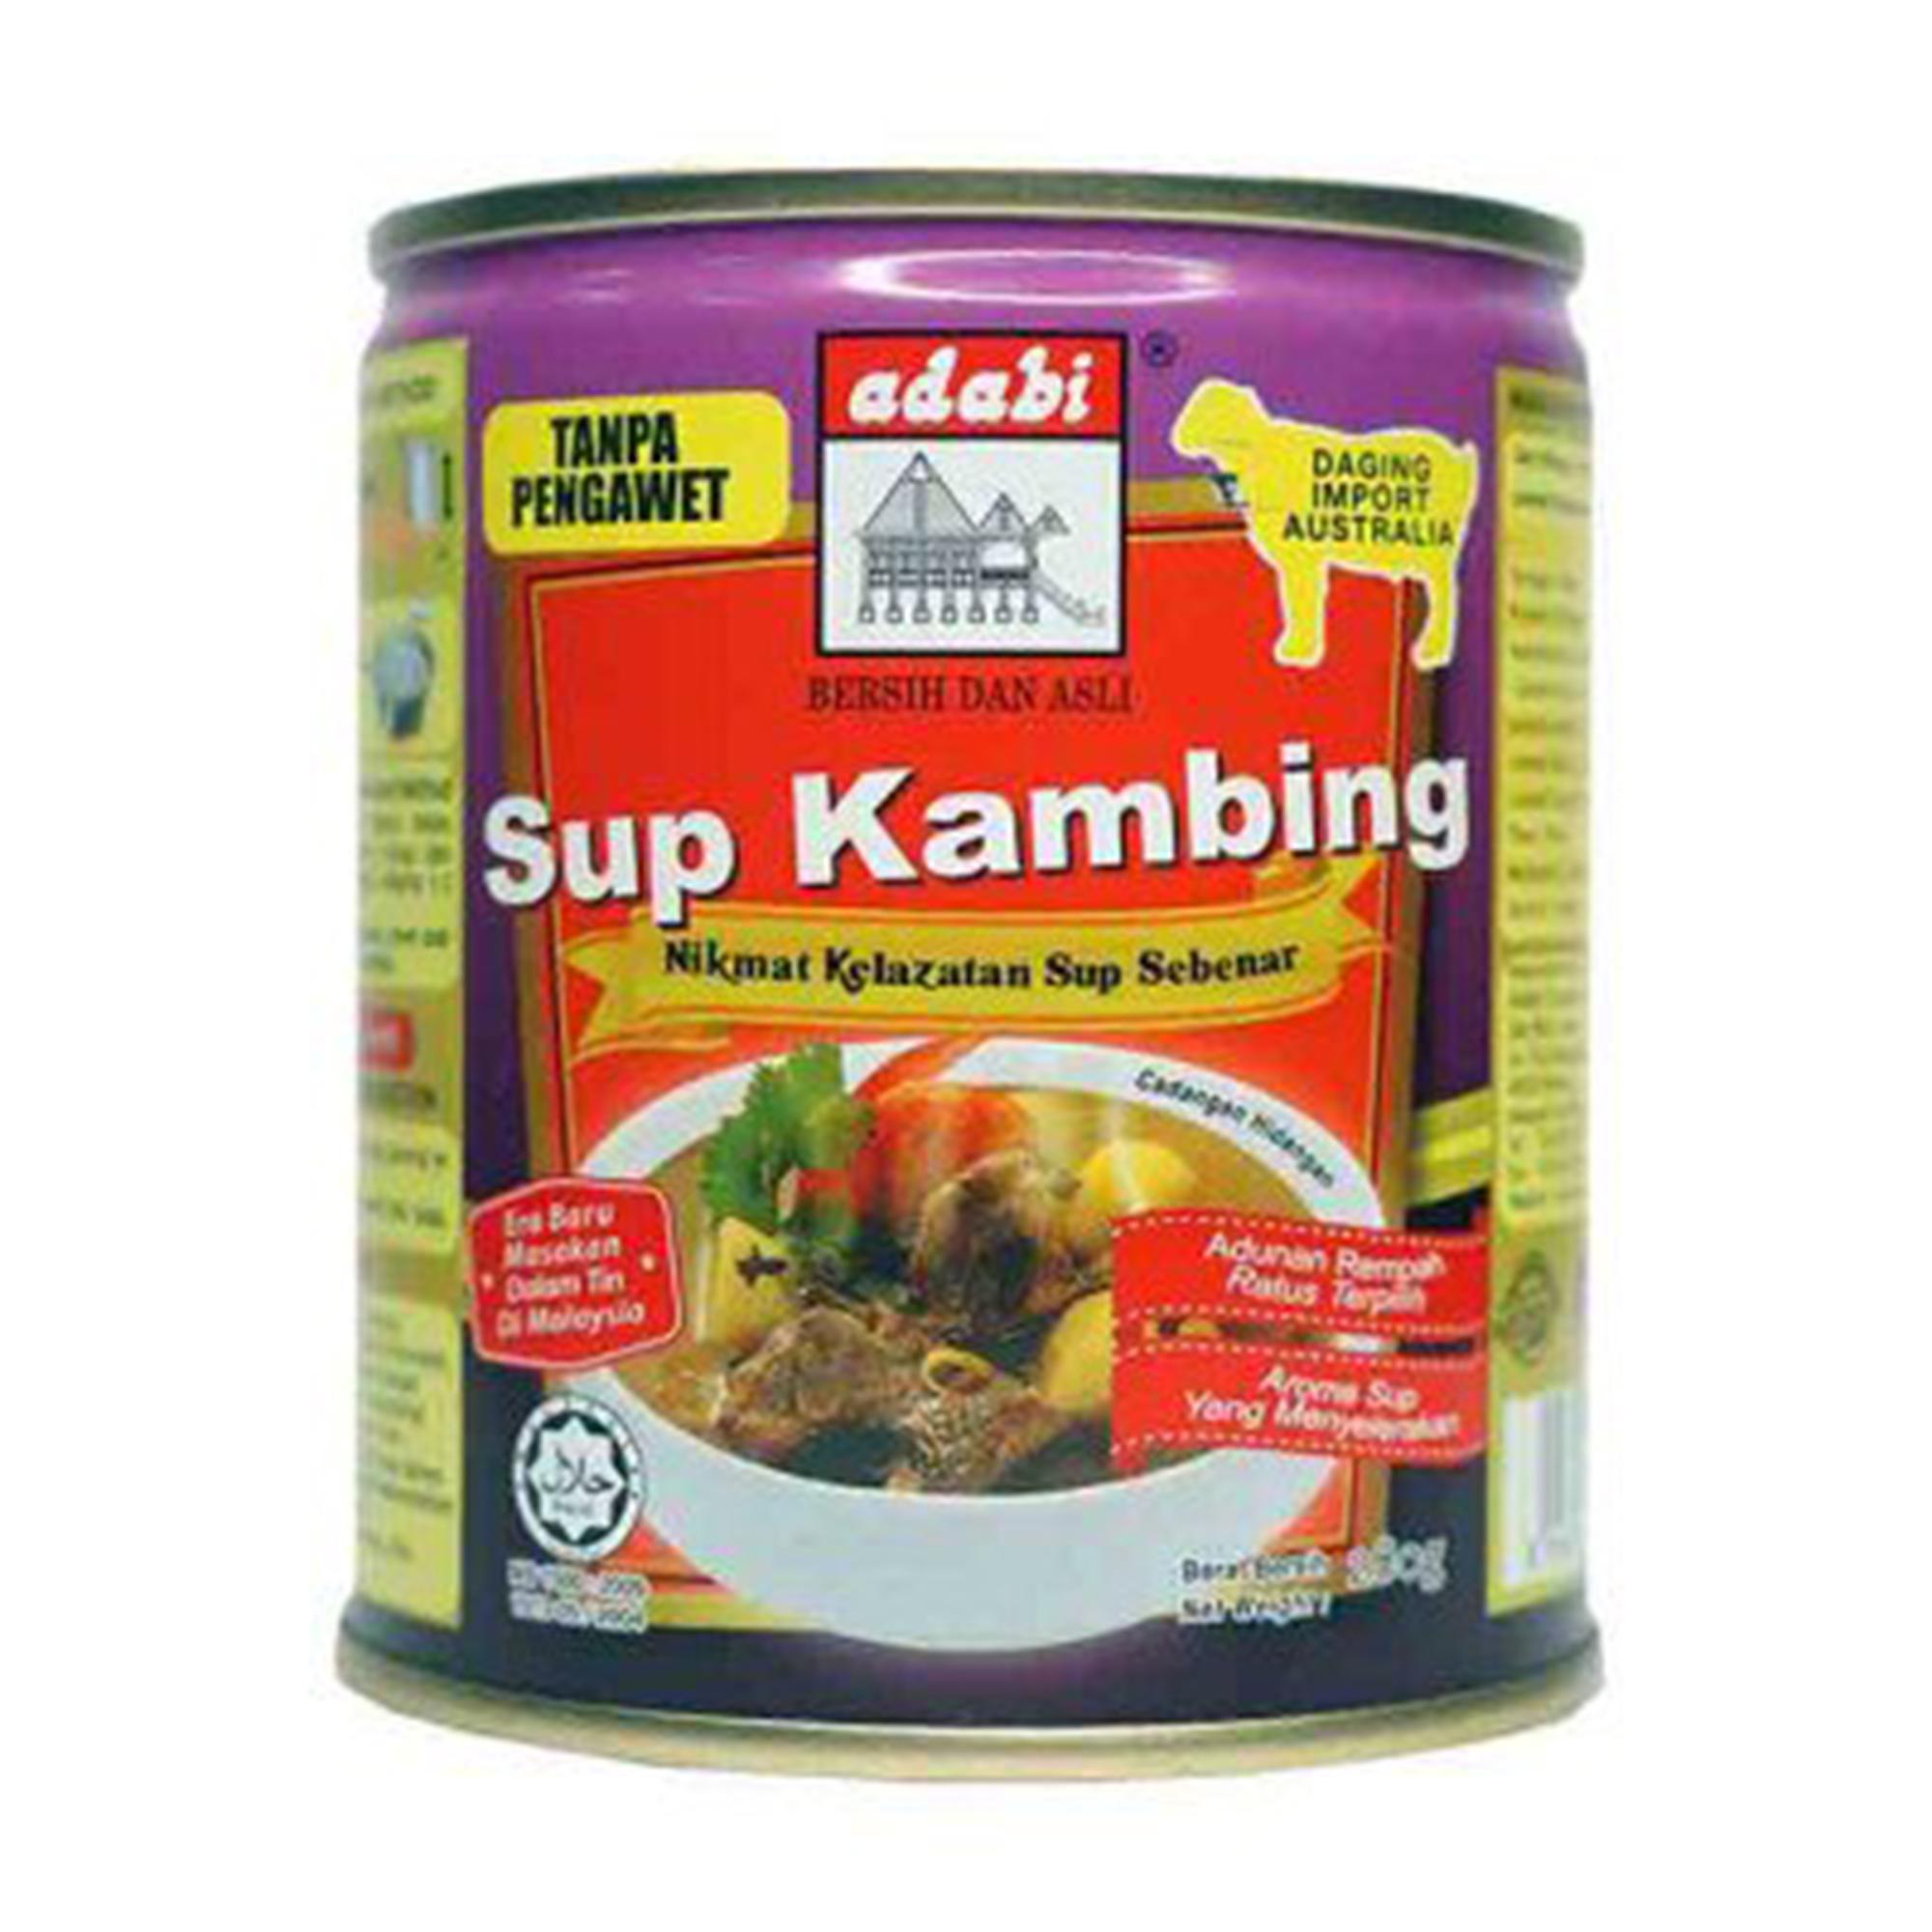 Sup Kambing 280g (1).jpg